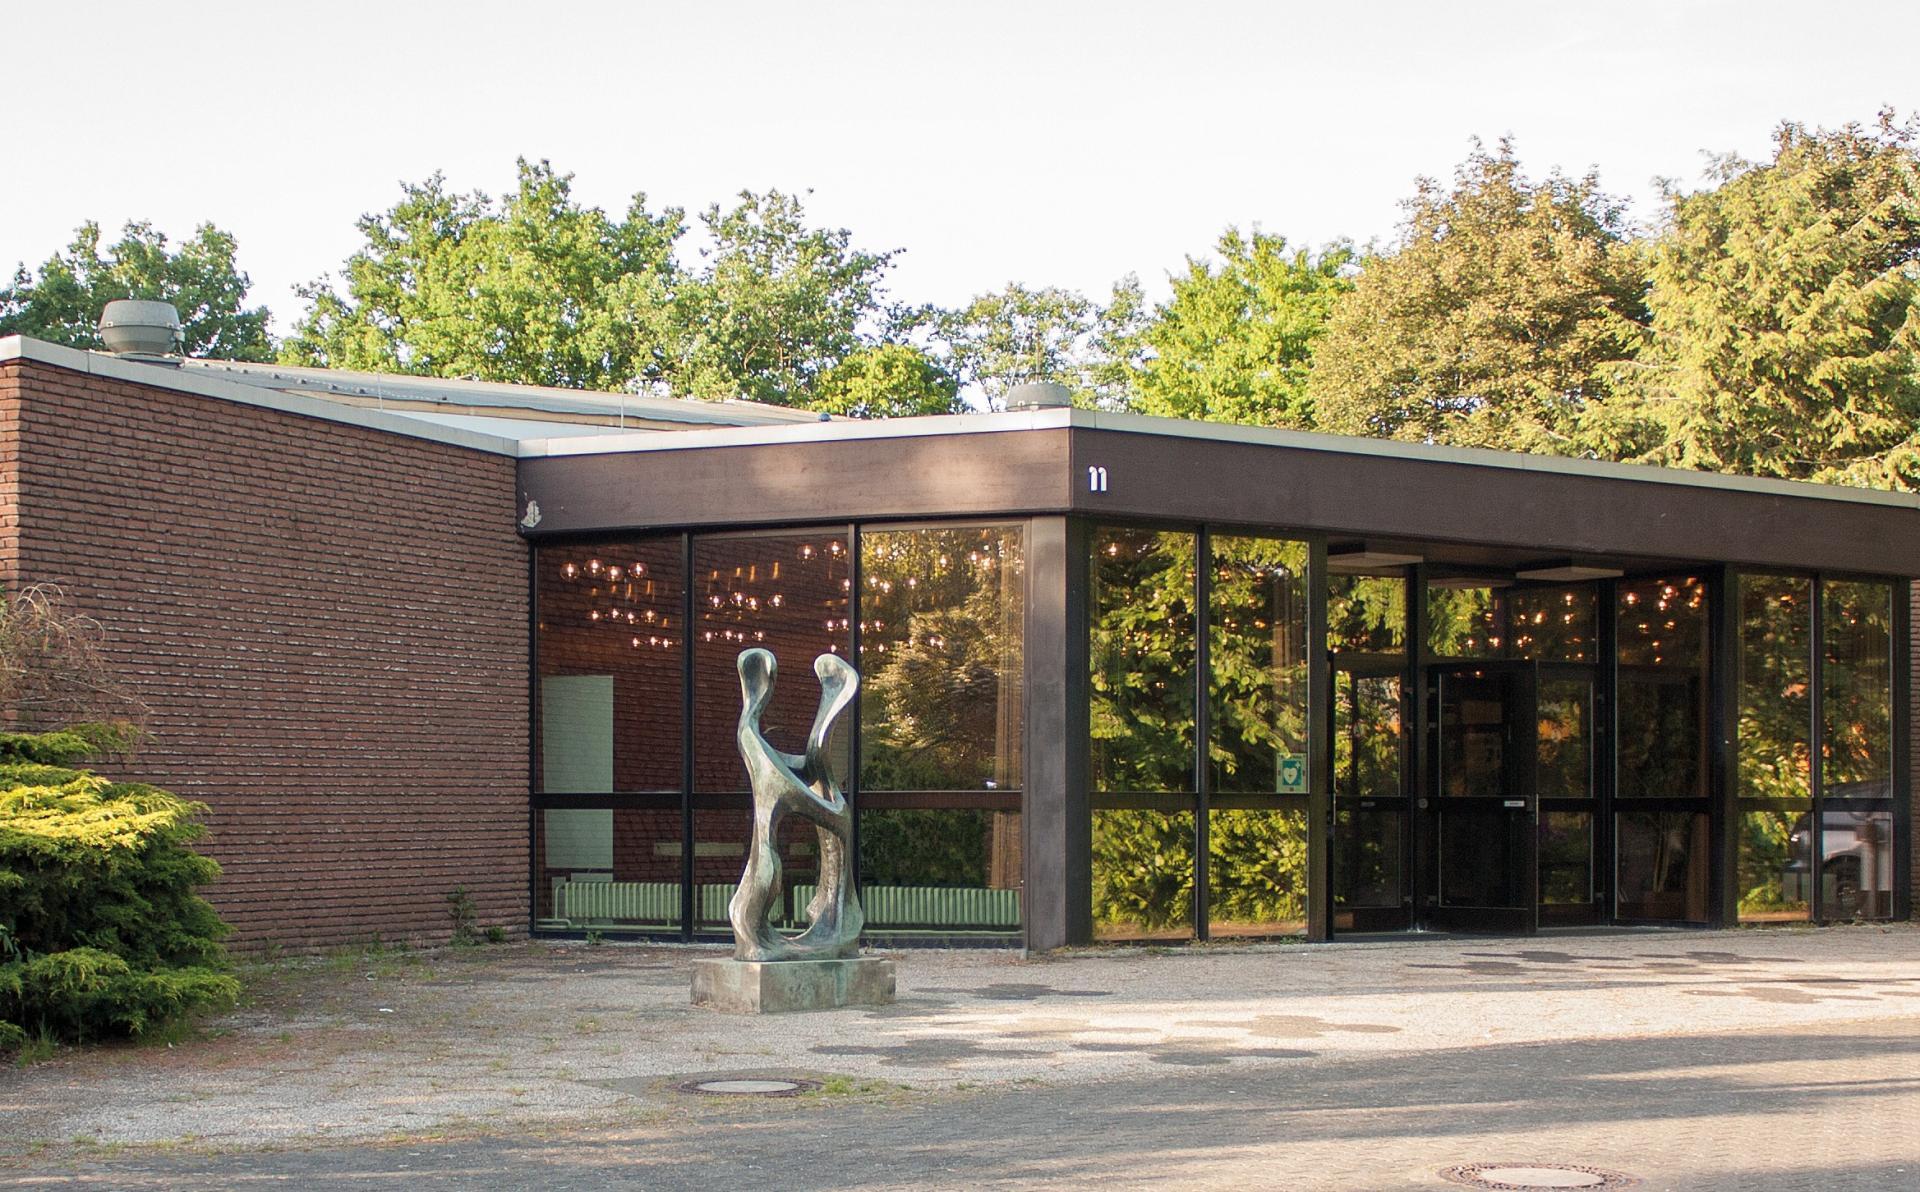 Kulturzentrum Rheinkamp_Ausschnitt_ Andreas Overländer